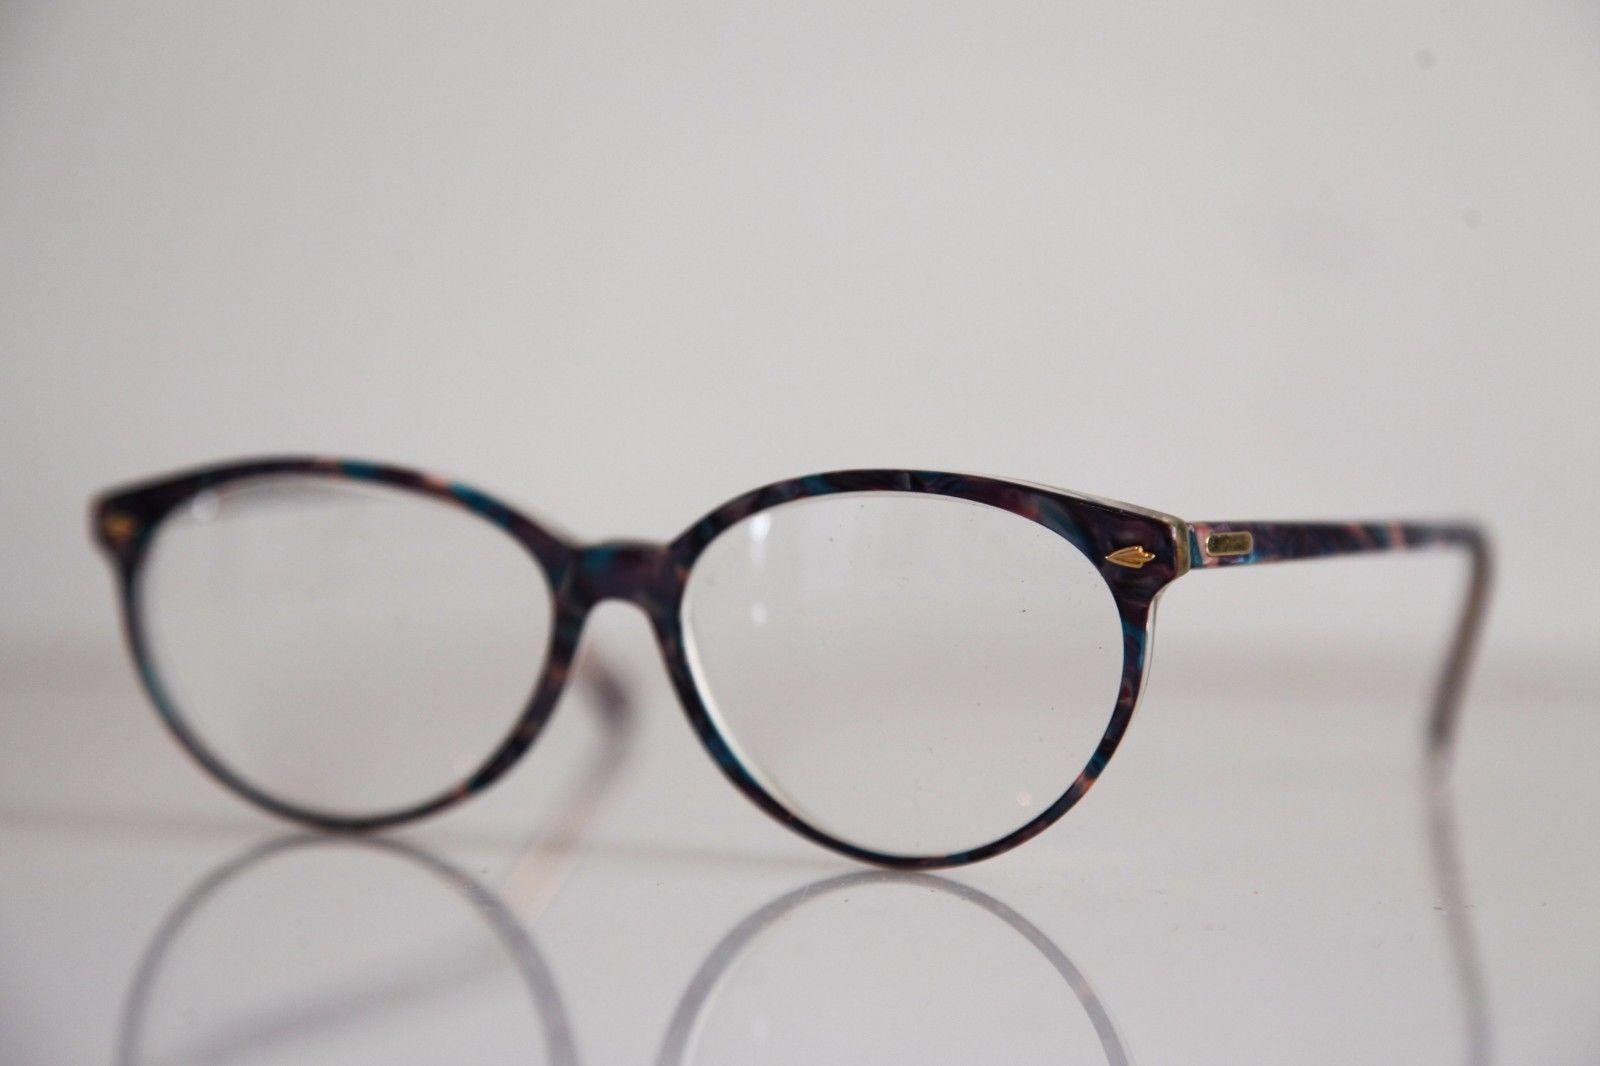 apollo optik eyewear multi color frame and similar items